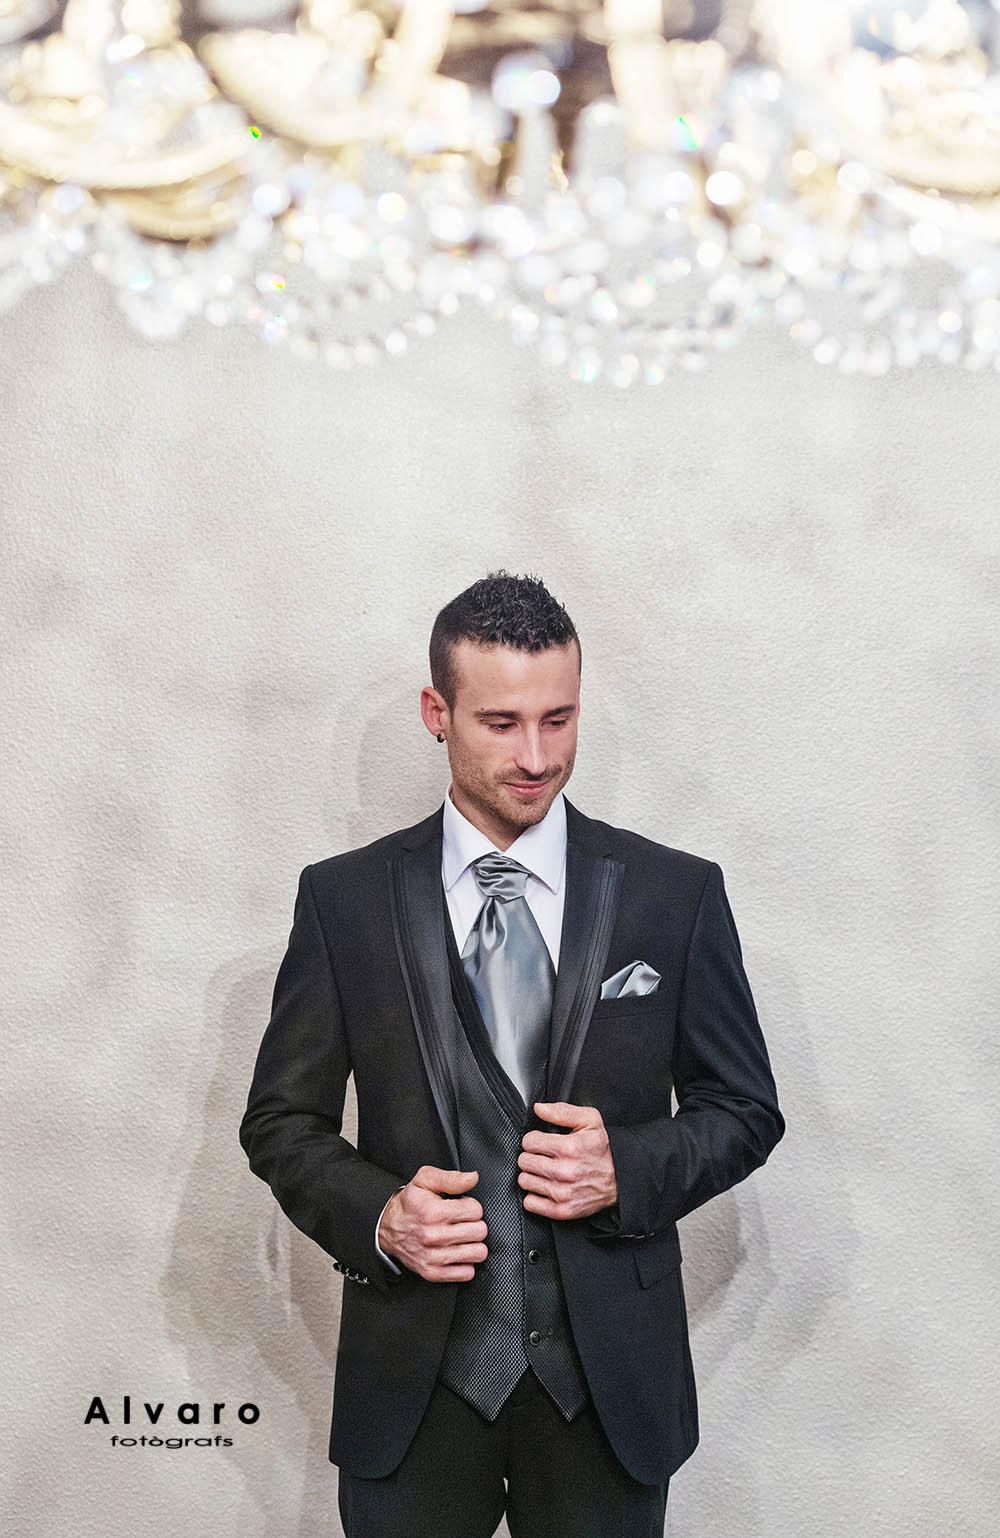 Matrimonio Jose Luis Repenning : Resumen boda jose luis sandra alvaro ruiz fotògrafs